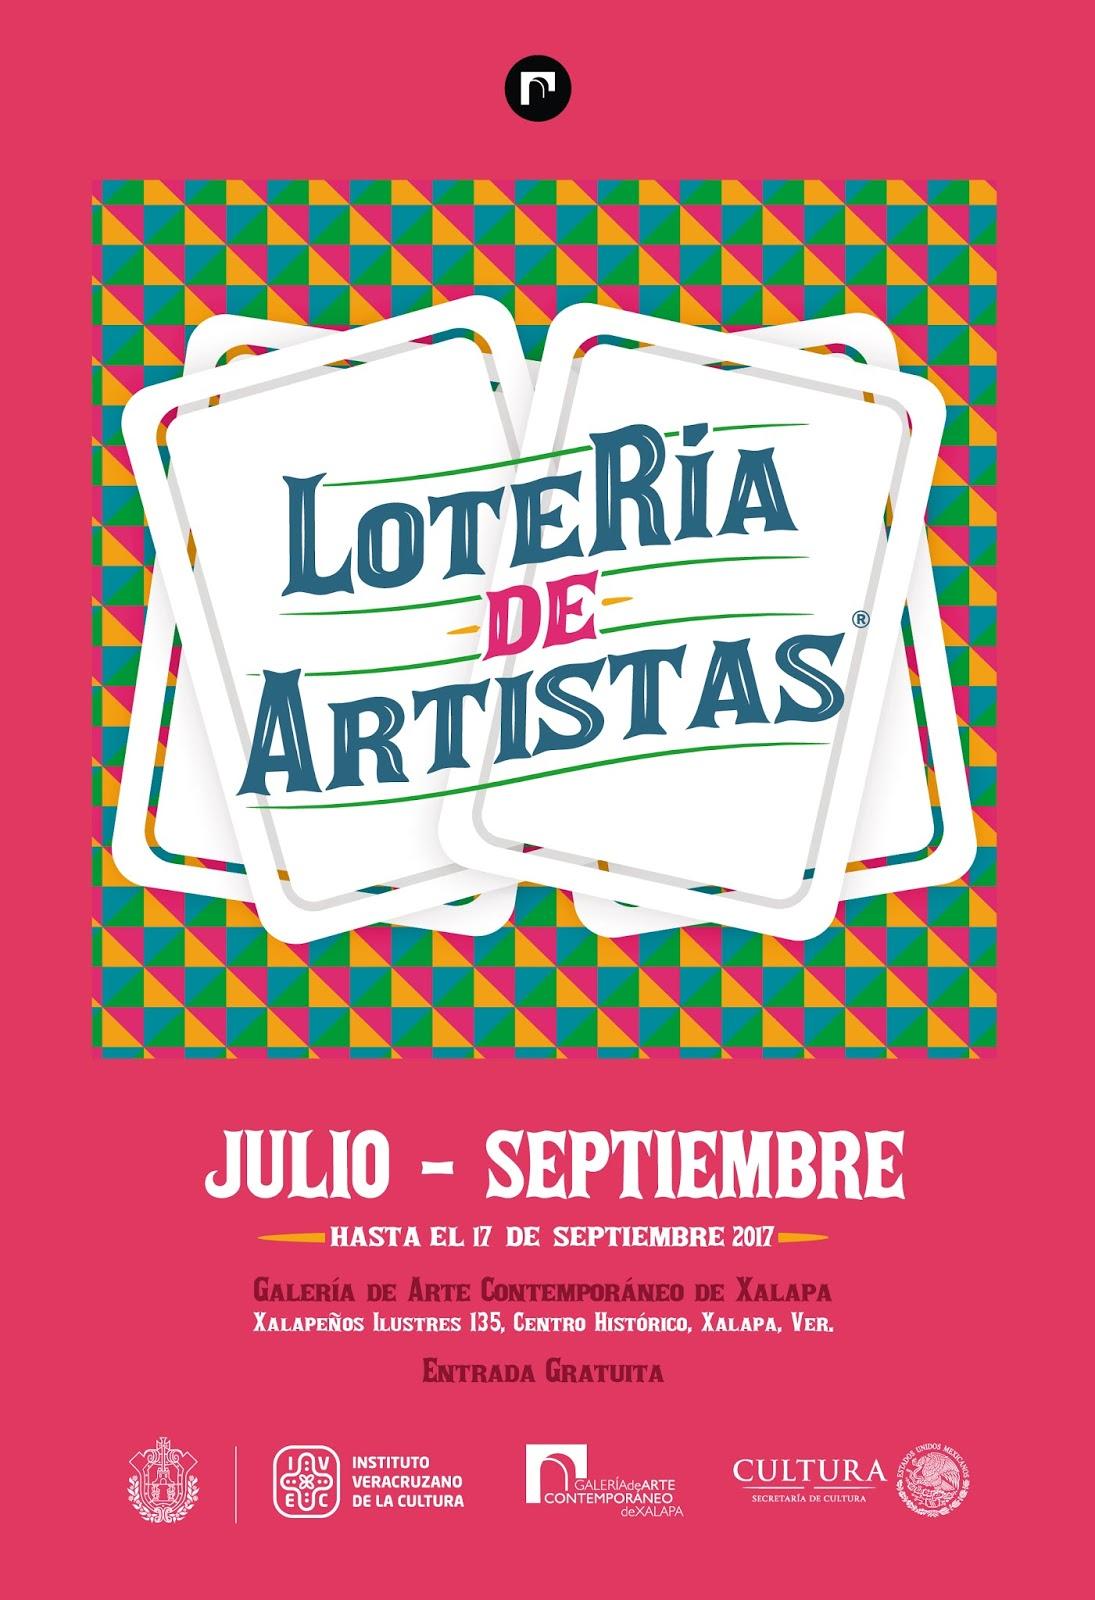 Galería de Arte Contemporáneo de Xalapa: Exposición LoteRía de Artistas